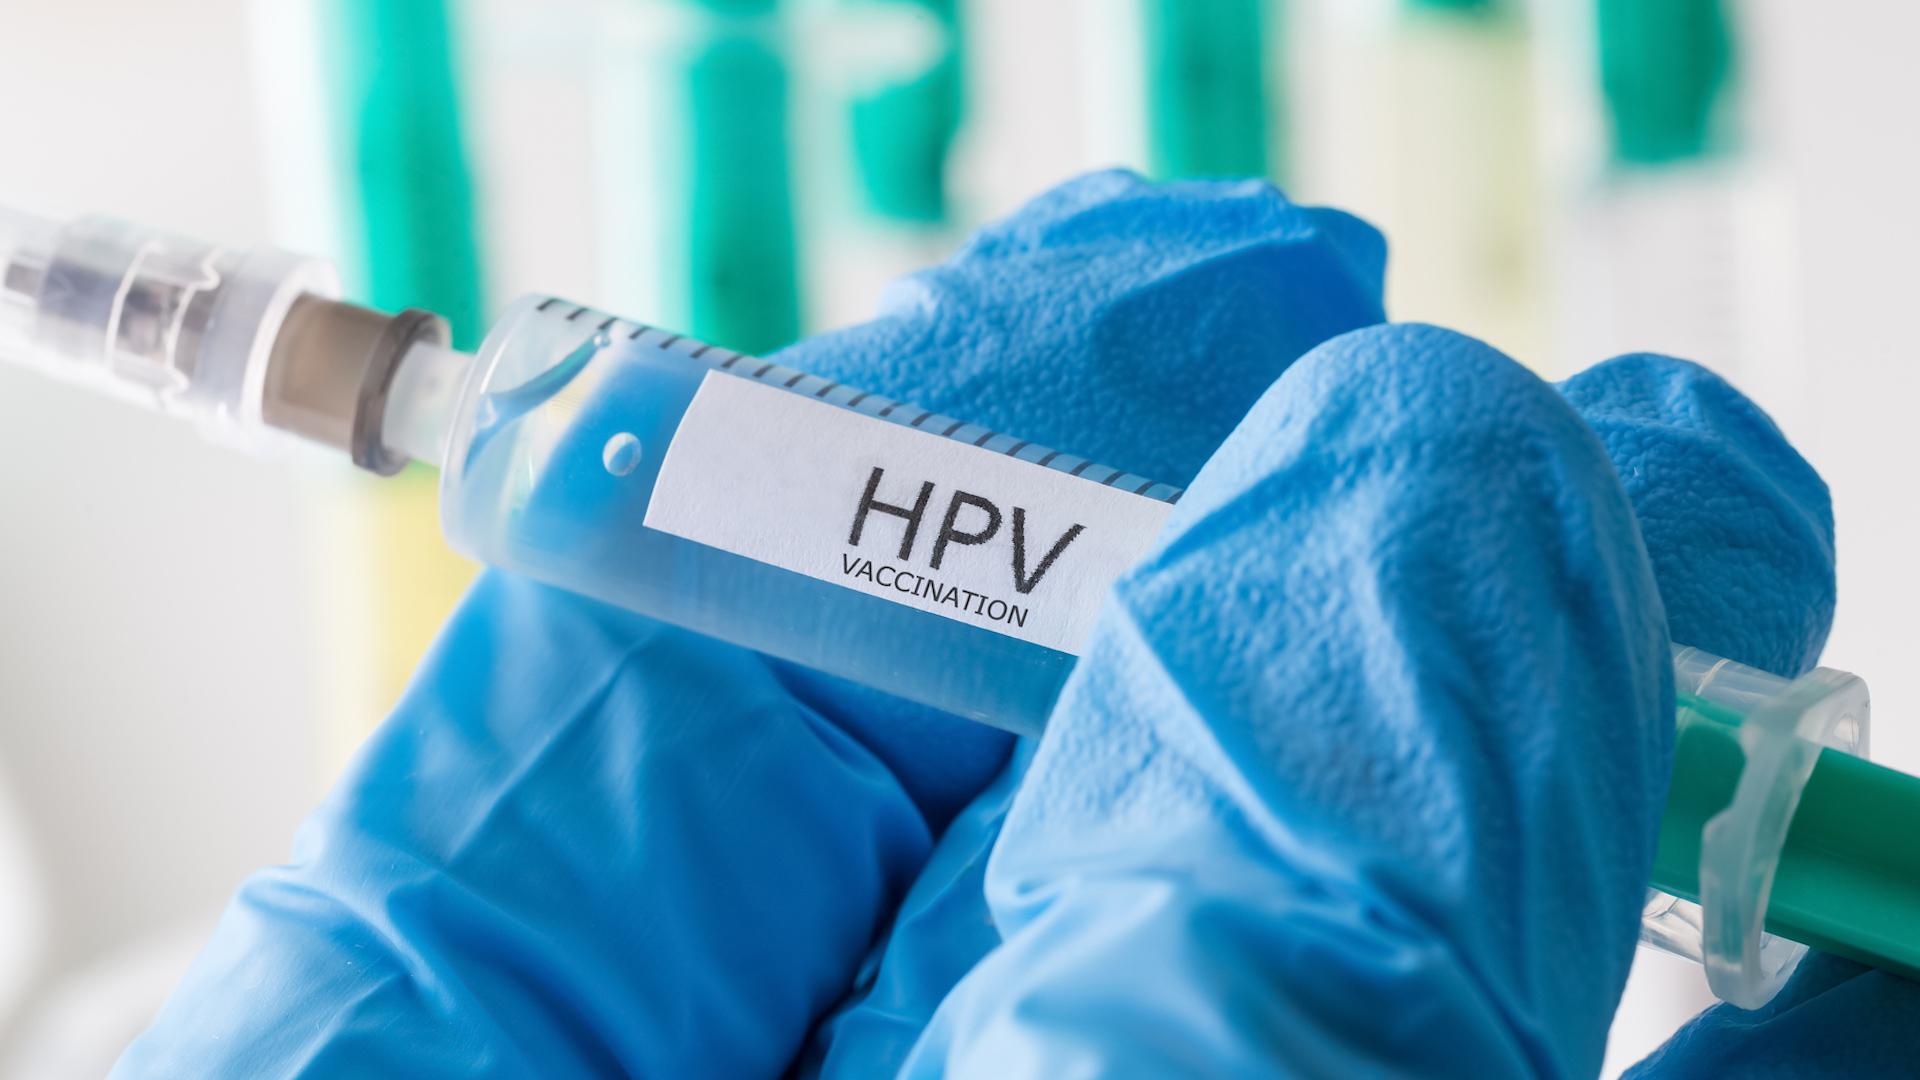 hpv treatment males human papillomavirus (hpv) test